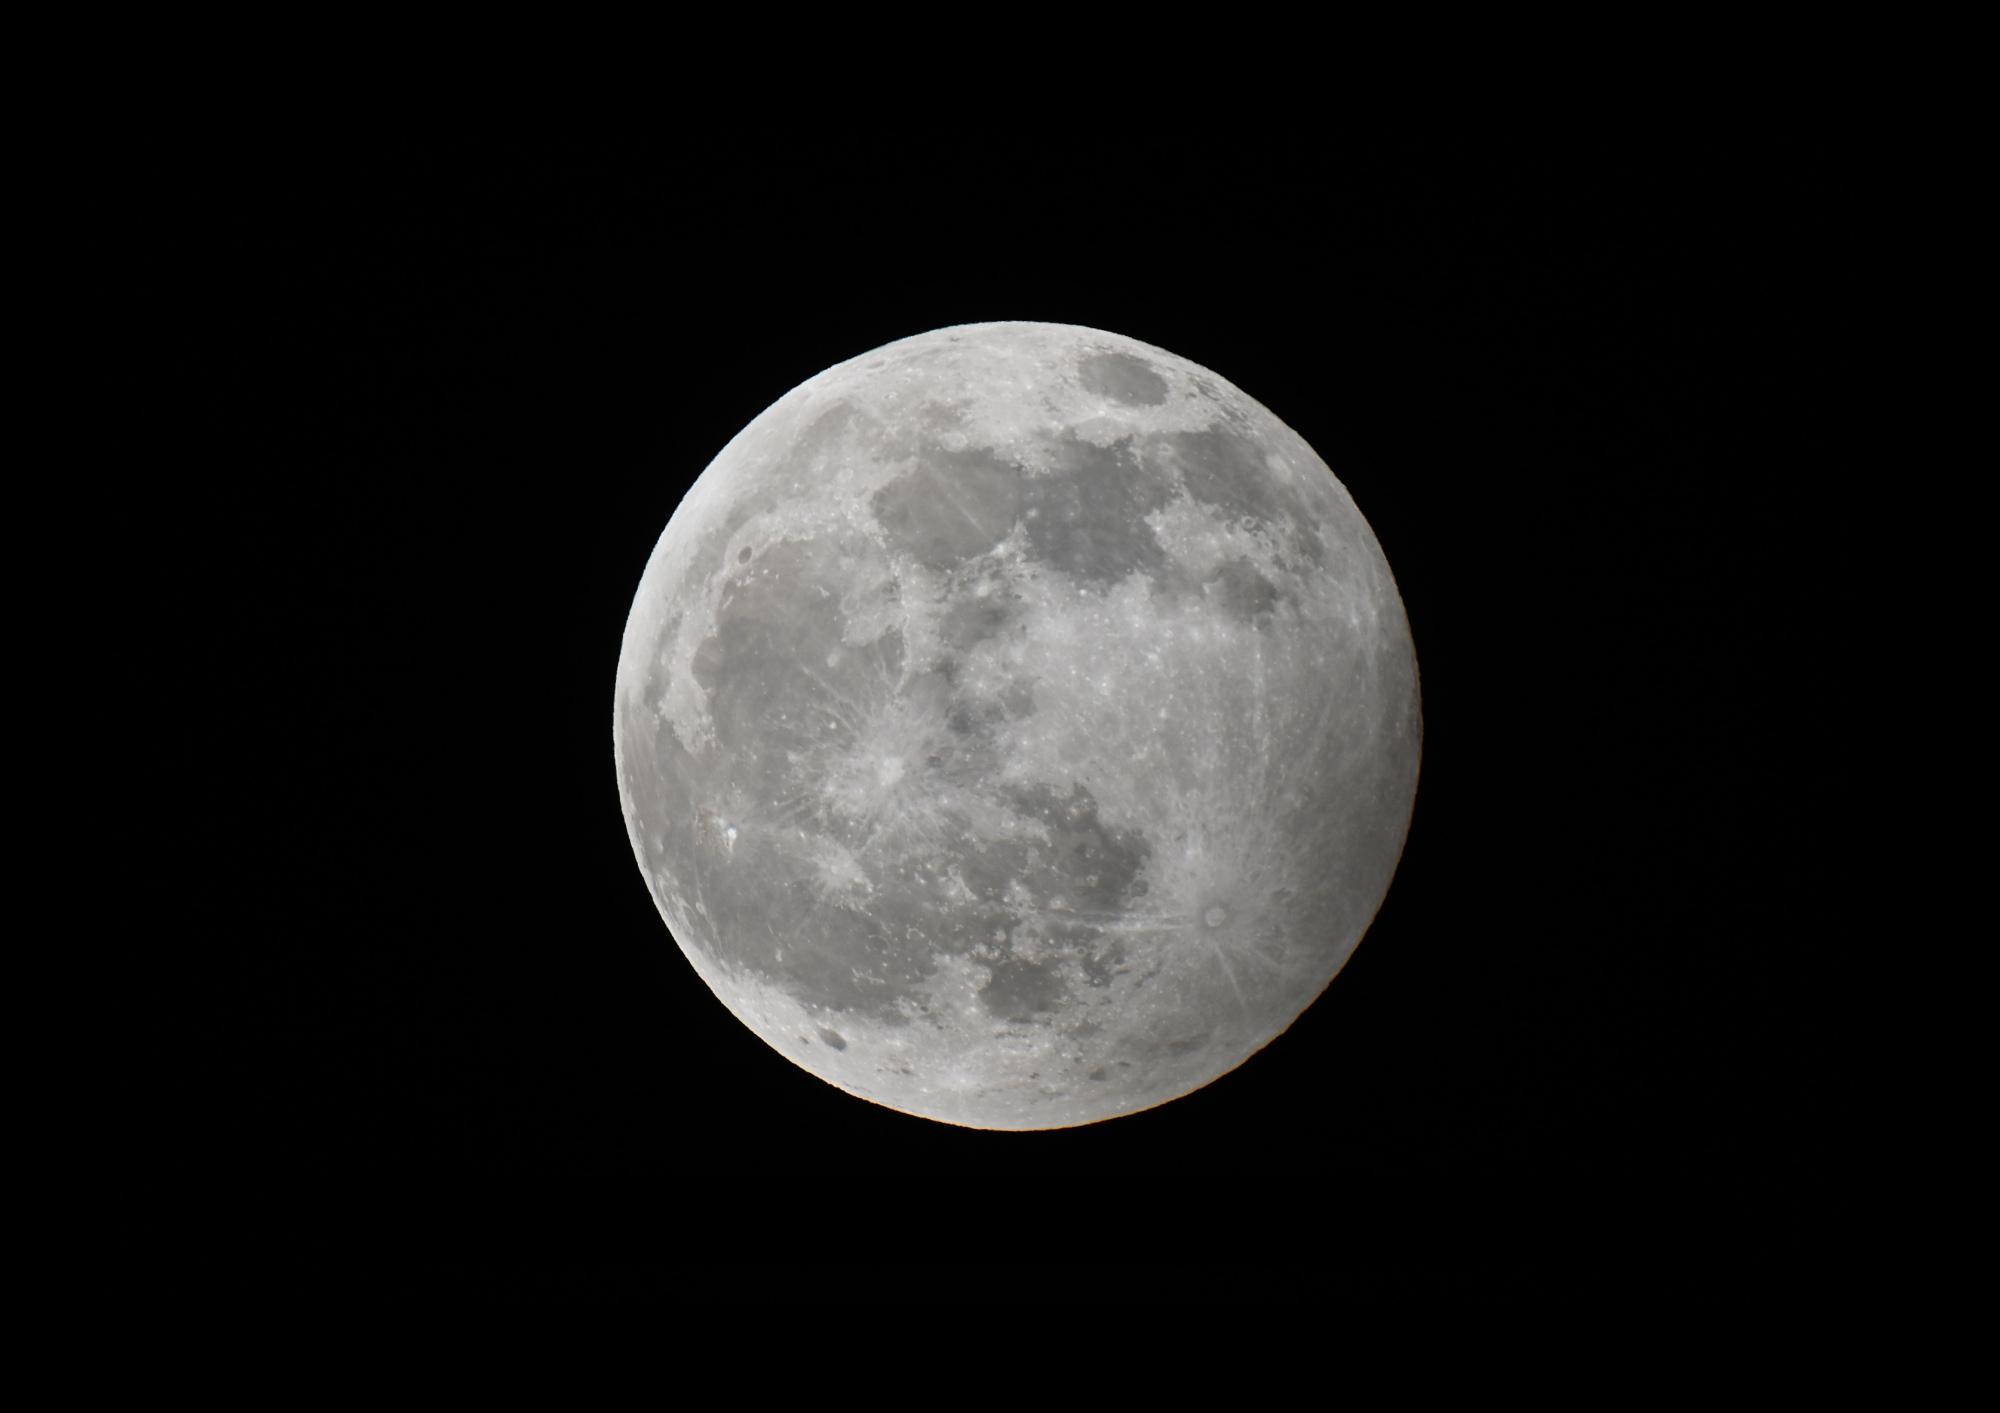 5e18e346342db_lune10jan19.thumb.jpg.3191454a0c5763ca50faf8e4f5bd26f5.jpg